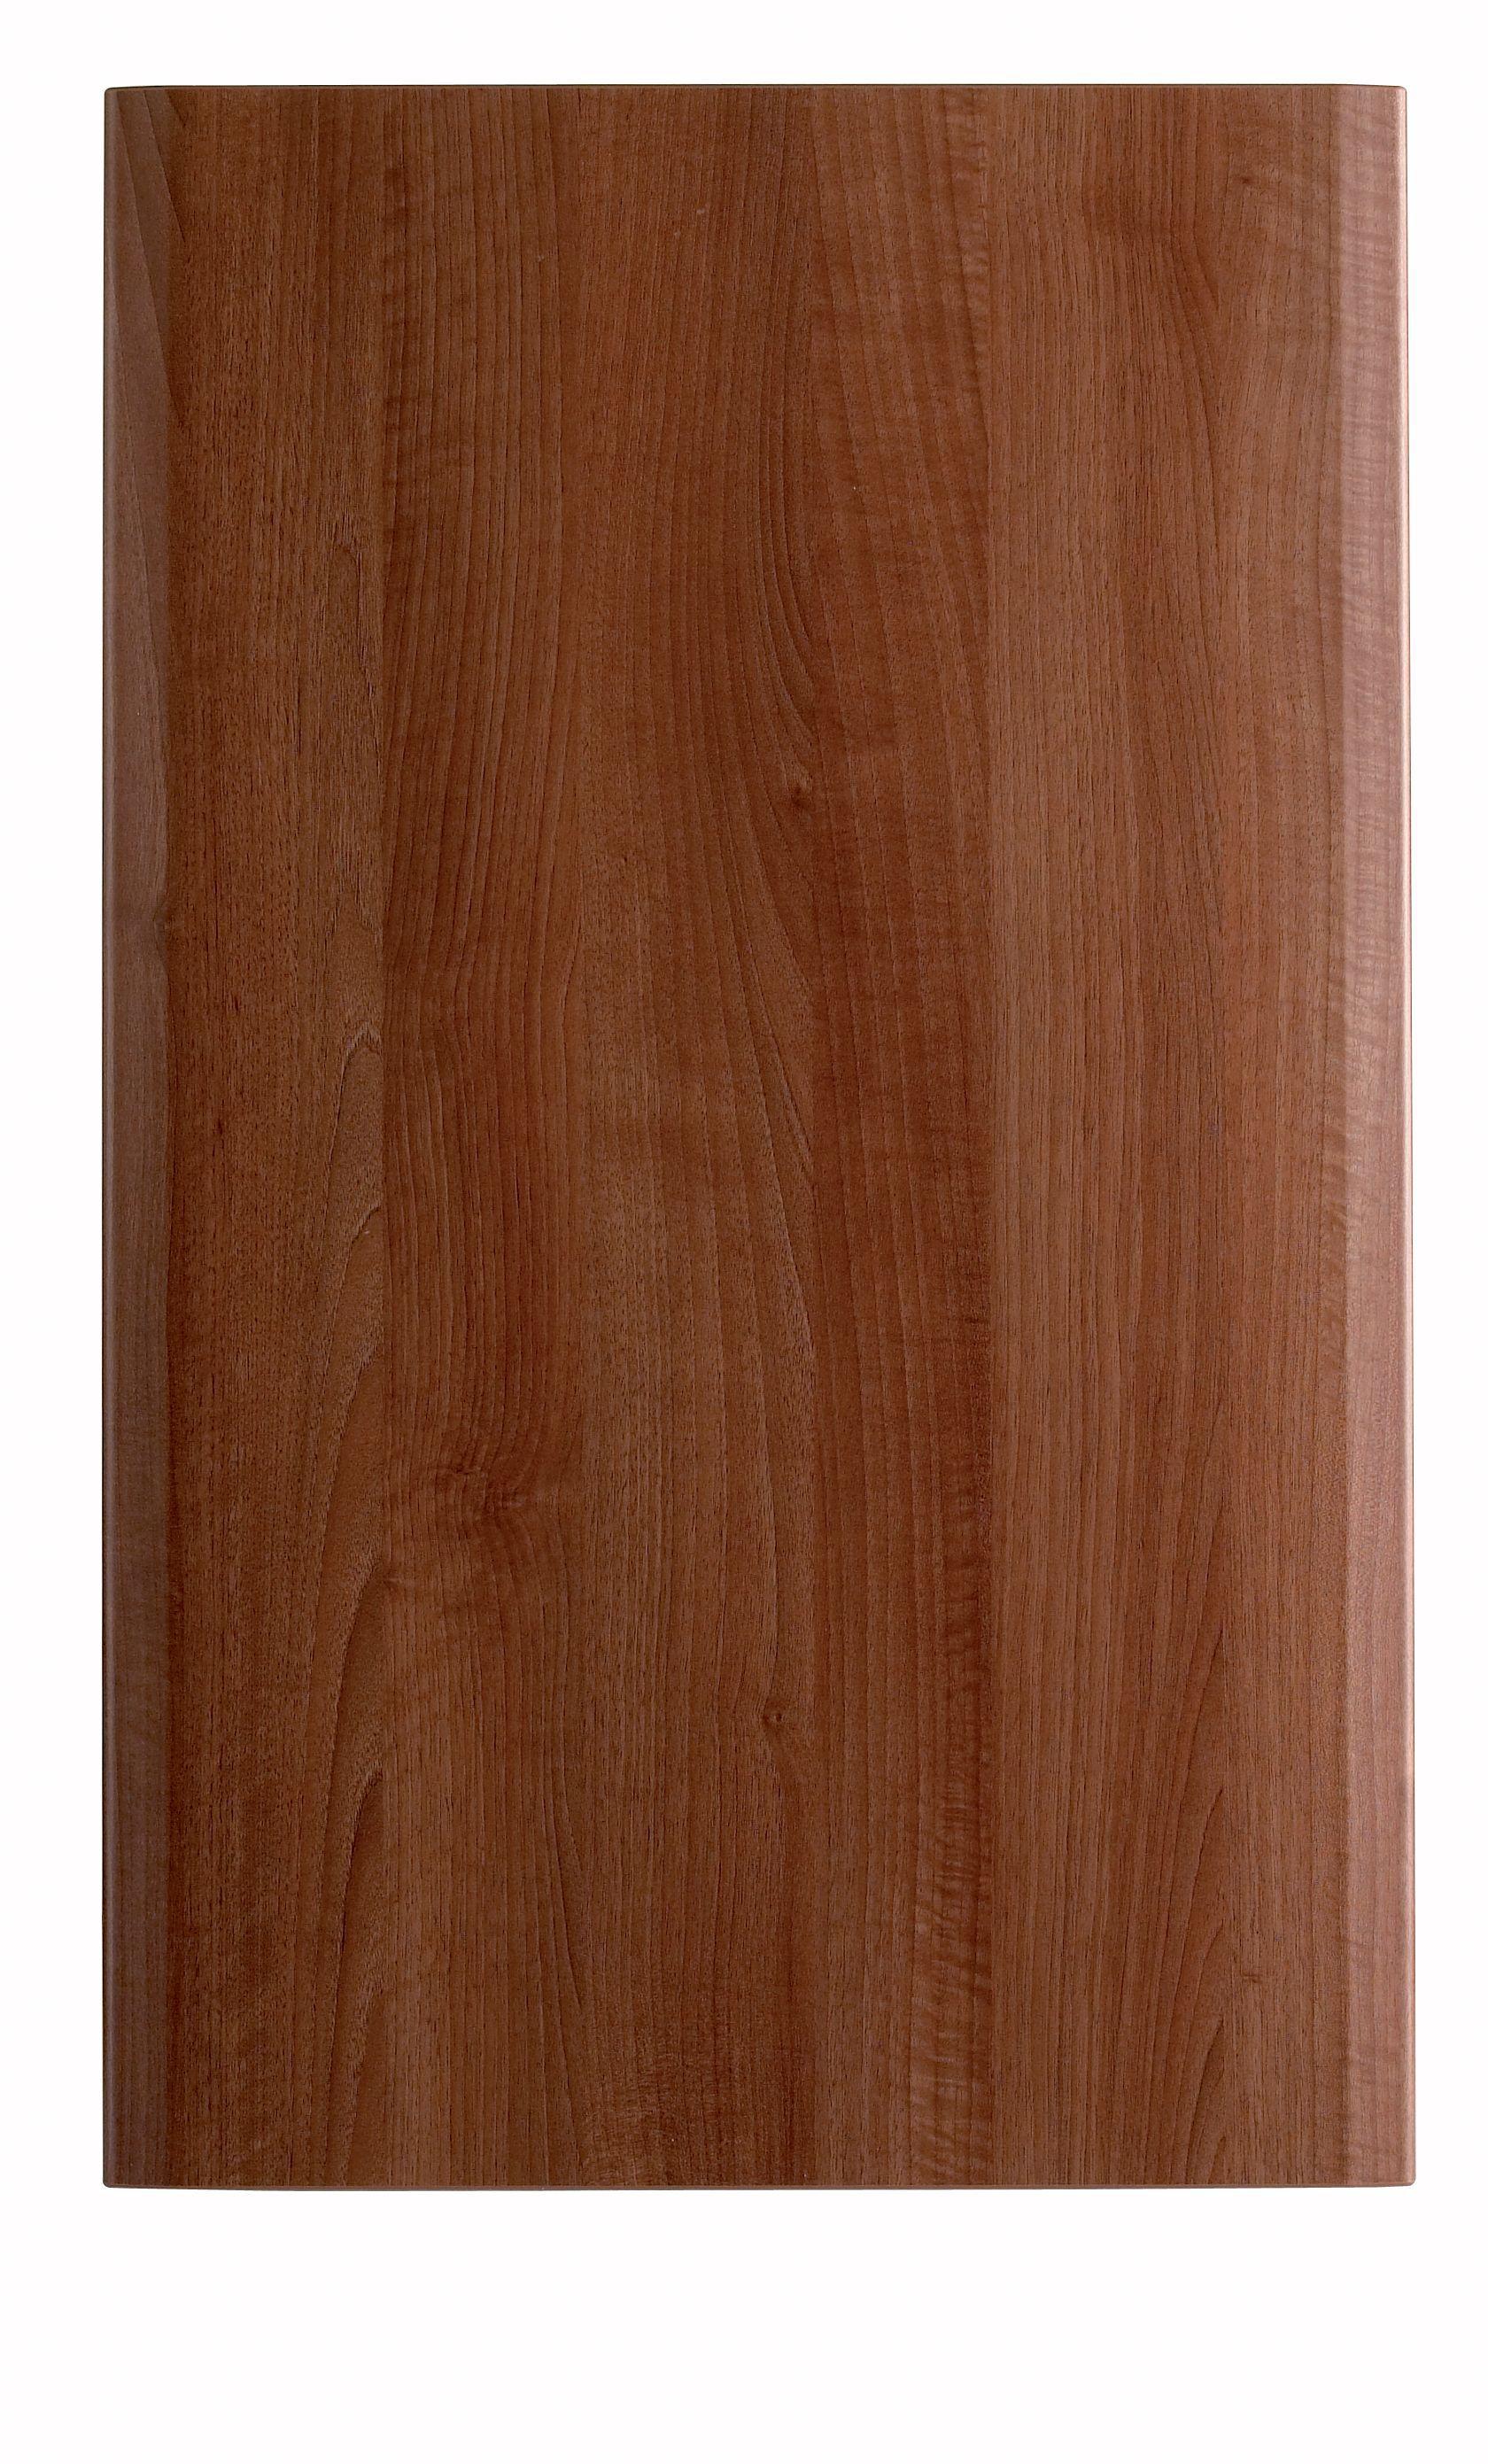 It Kitchens Sandford Walnut Effect Modern Larder Door (w)600mm, Set Of 2